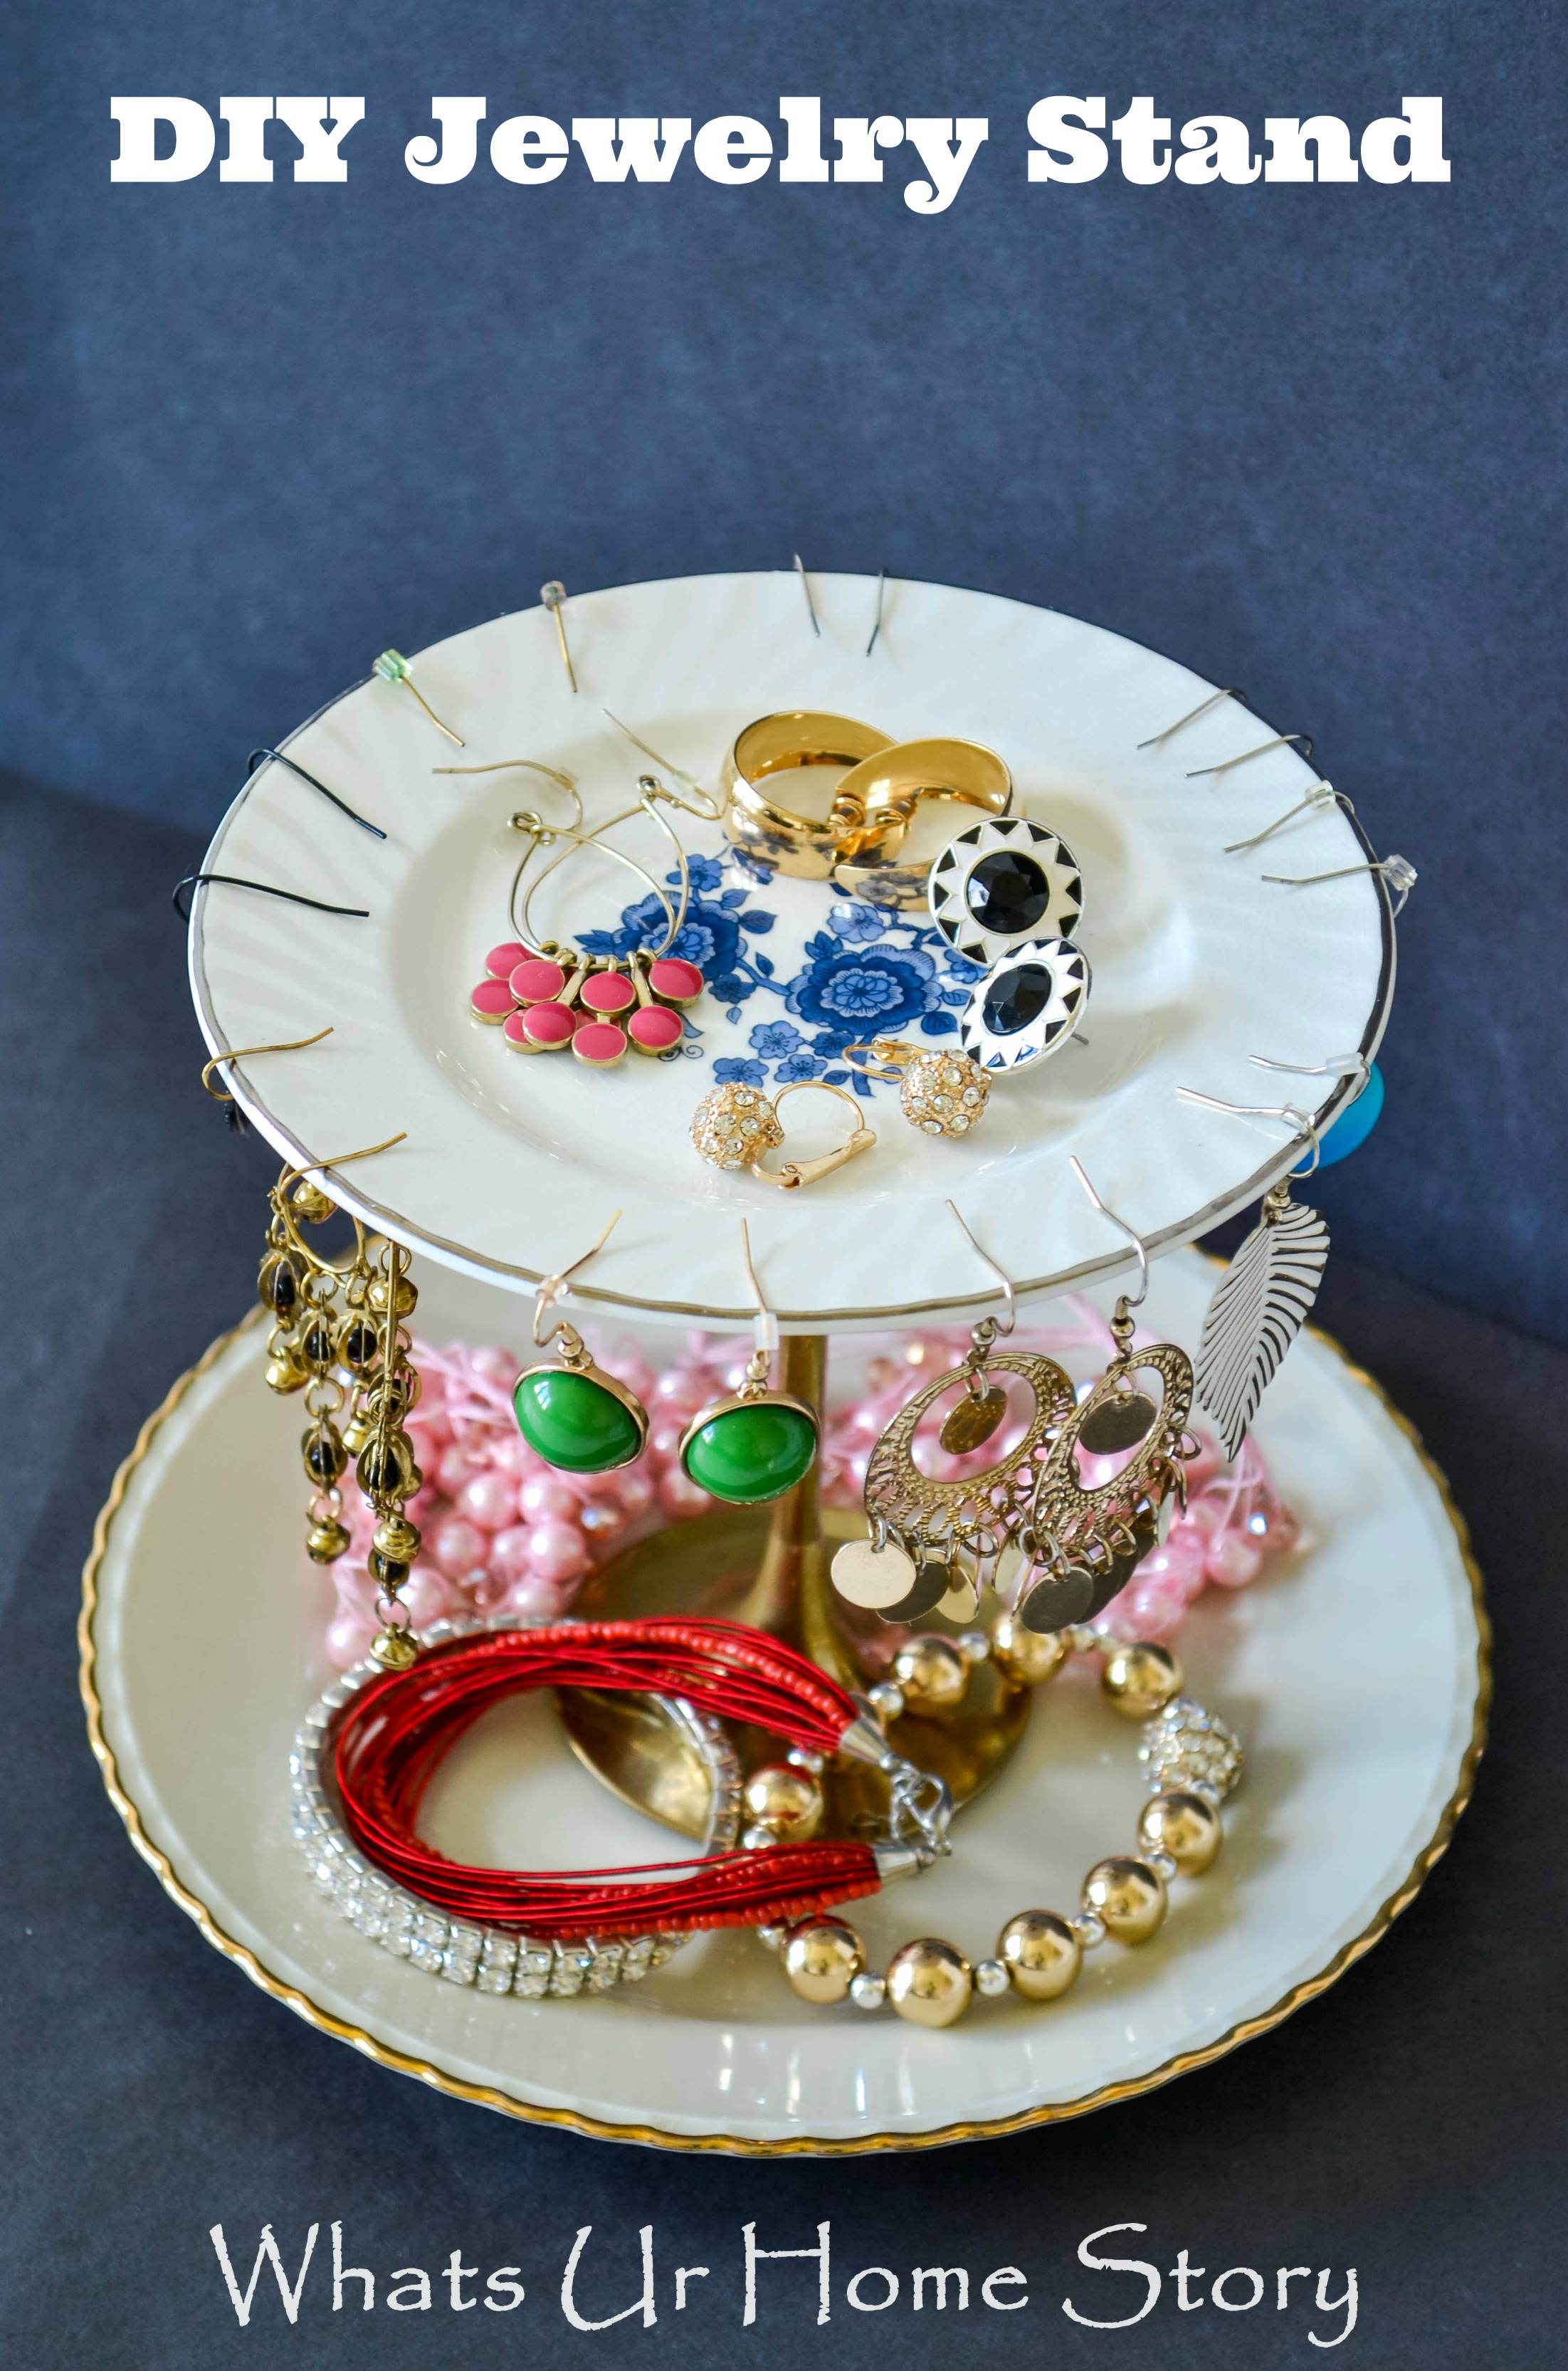 Tiered Jewelry Stand & Tiered Jewelry Stand | Whats Ur Home Story